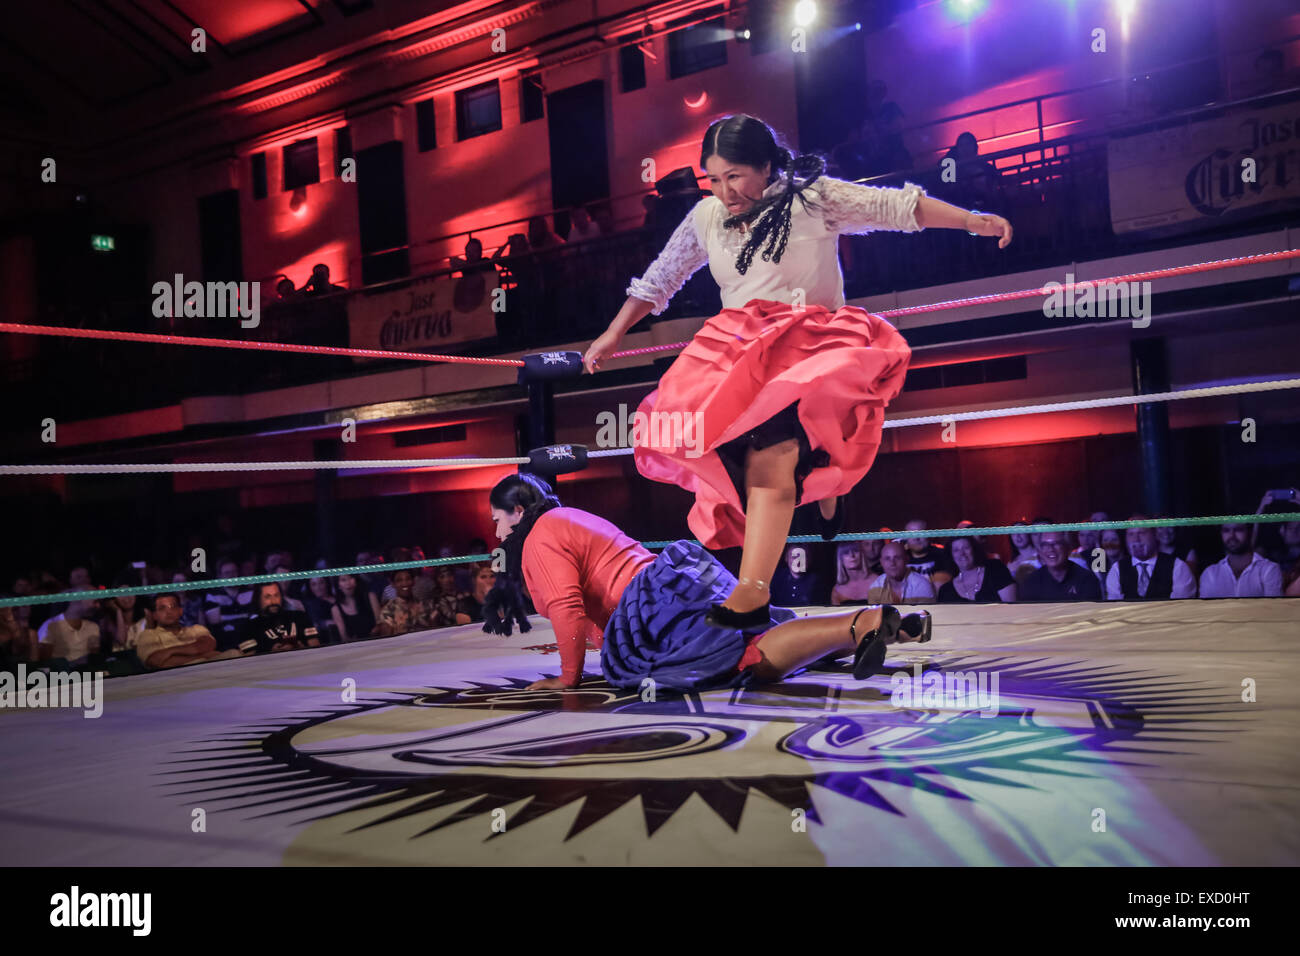 London, UK. 11th July, 2015. lucha libre  Mexican free fighting at York Hall, London , UK Credit:  carol moir/Alamy - Stock Image